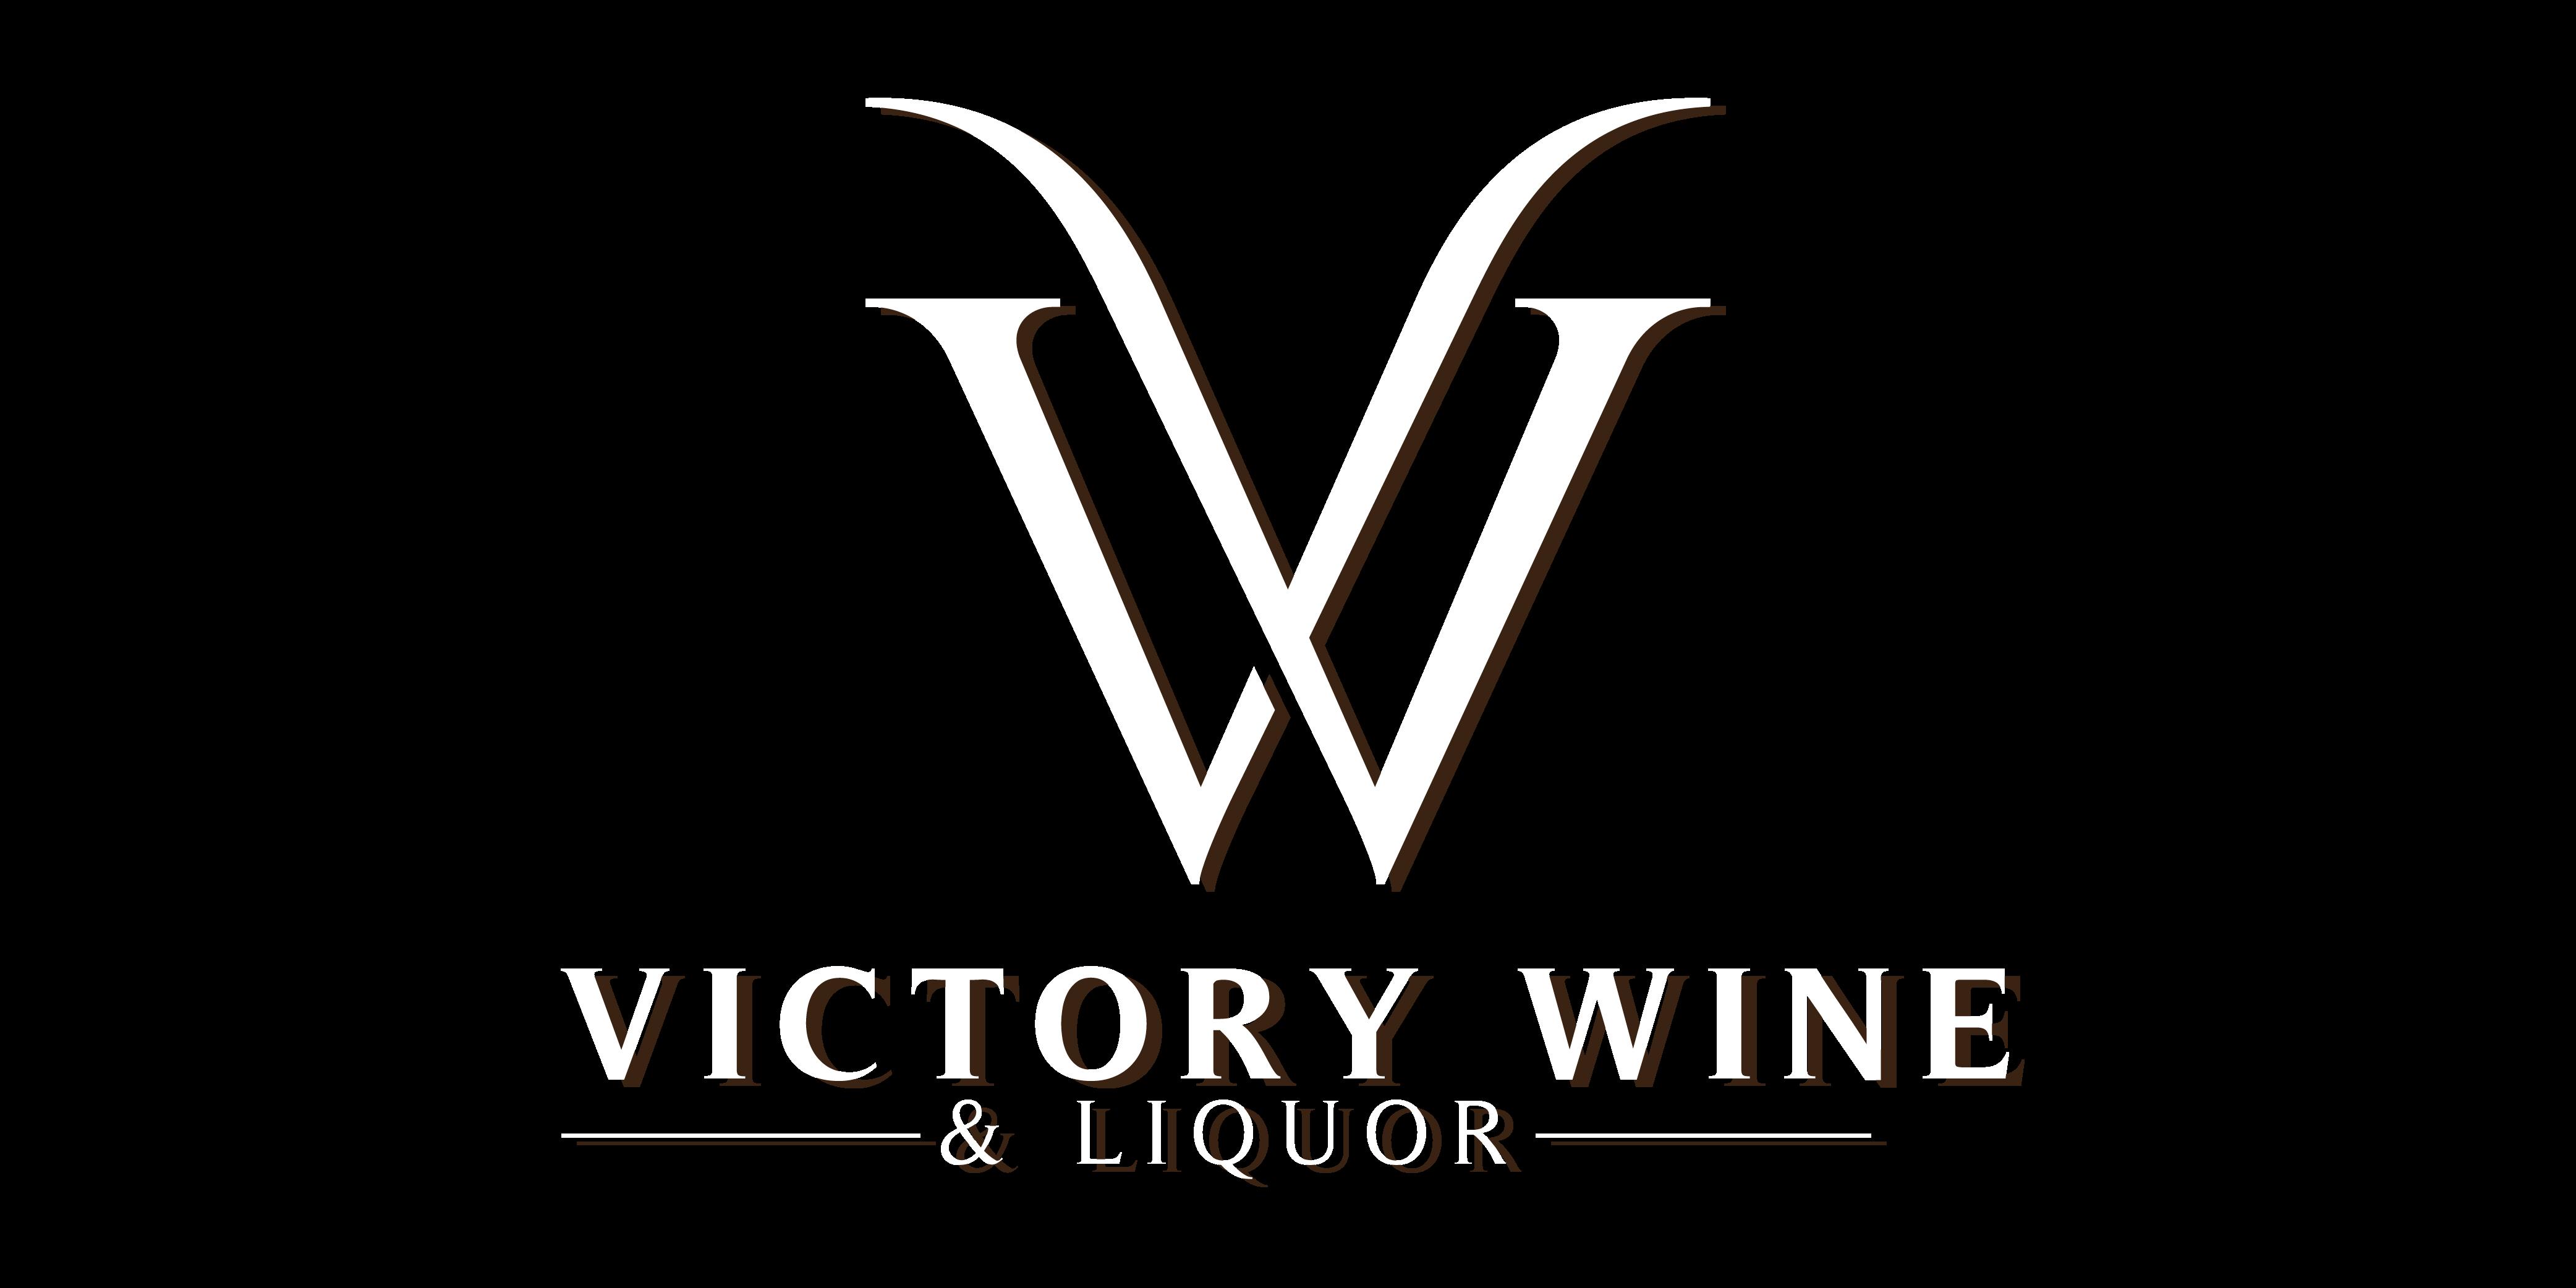 Victory Wines & Liquor